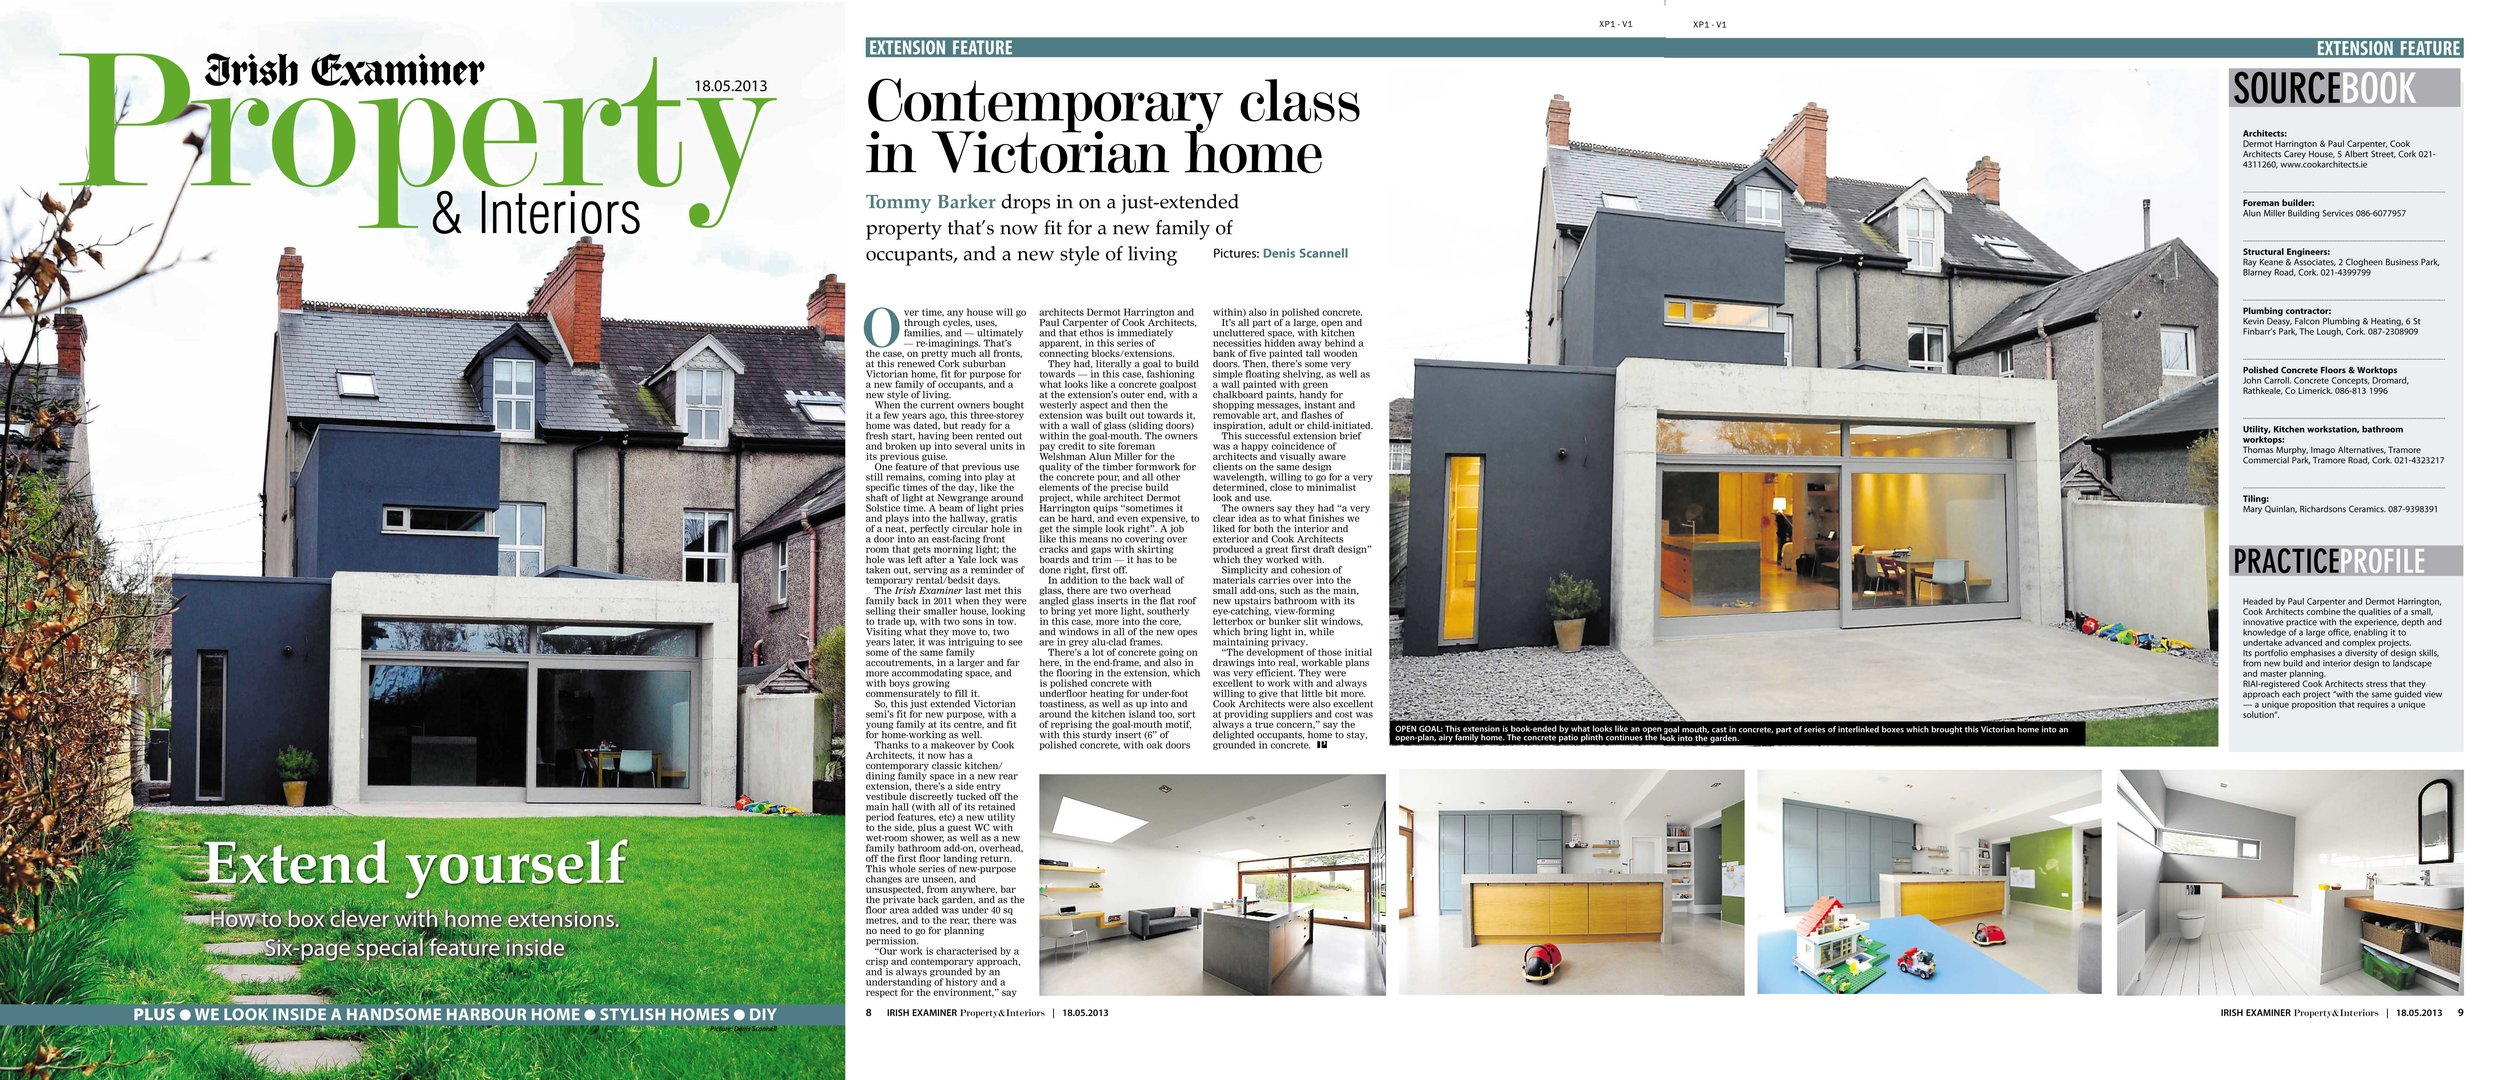 Irish Examiner 18.05.2013 - Irish Examiner - Property supplement May 2013